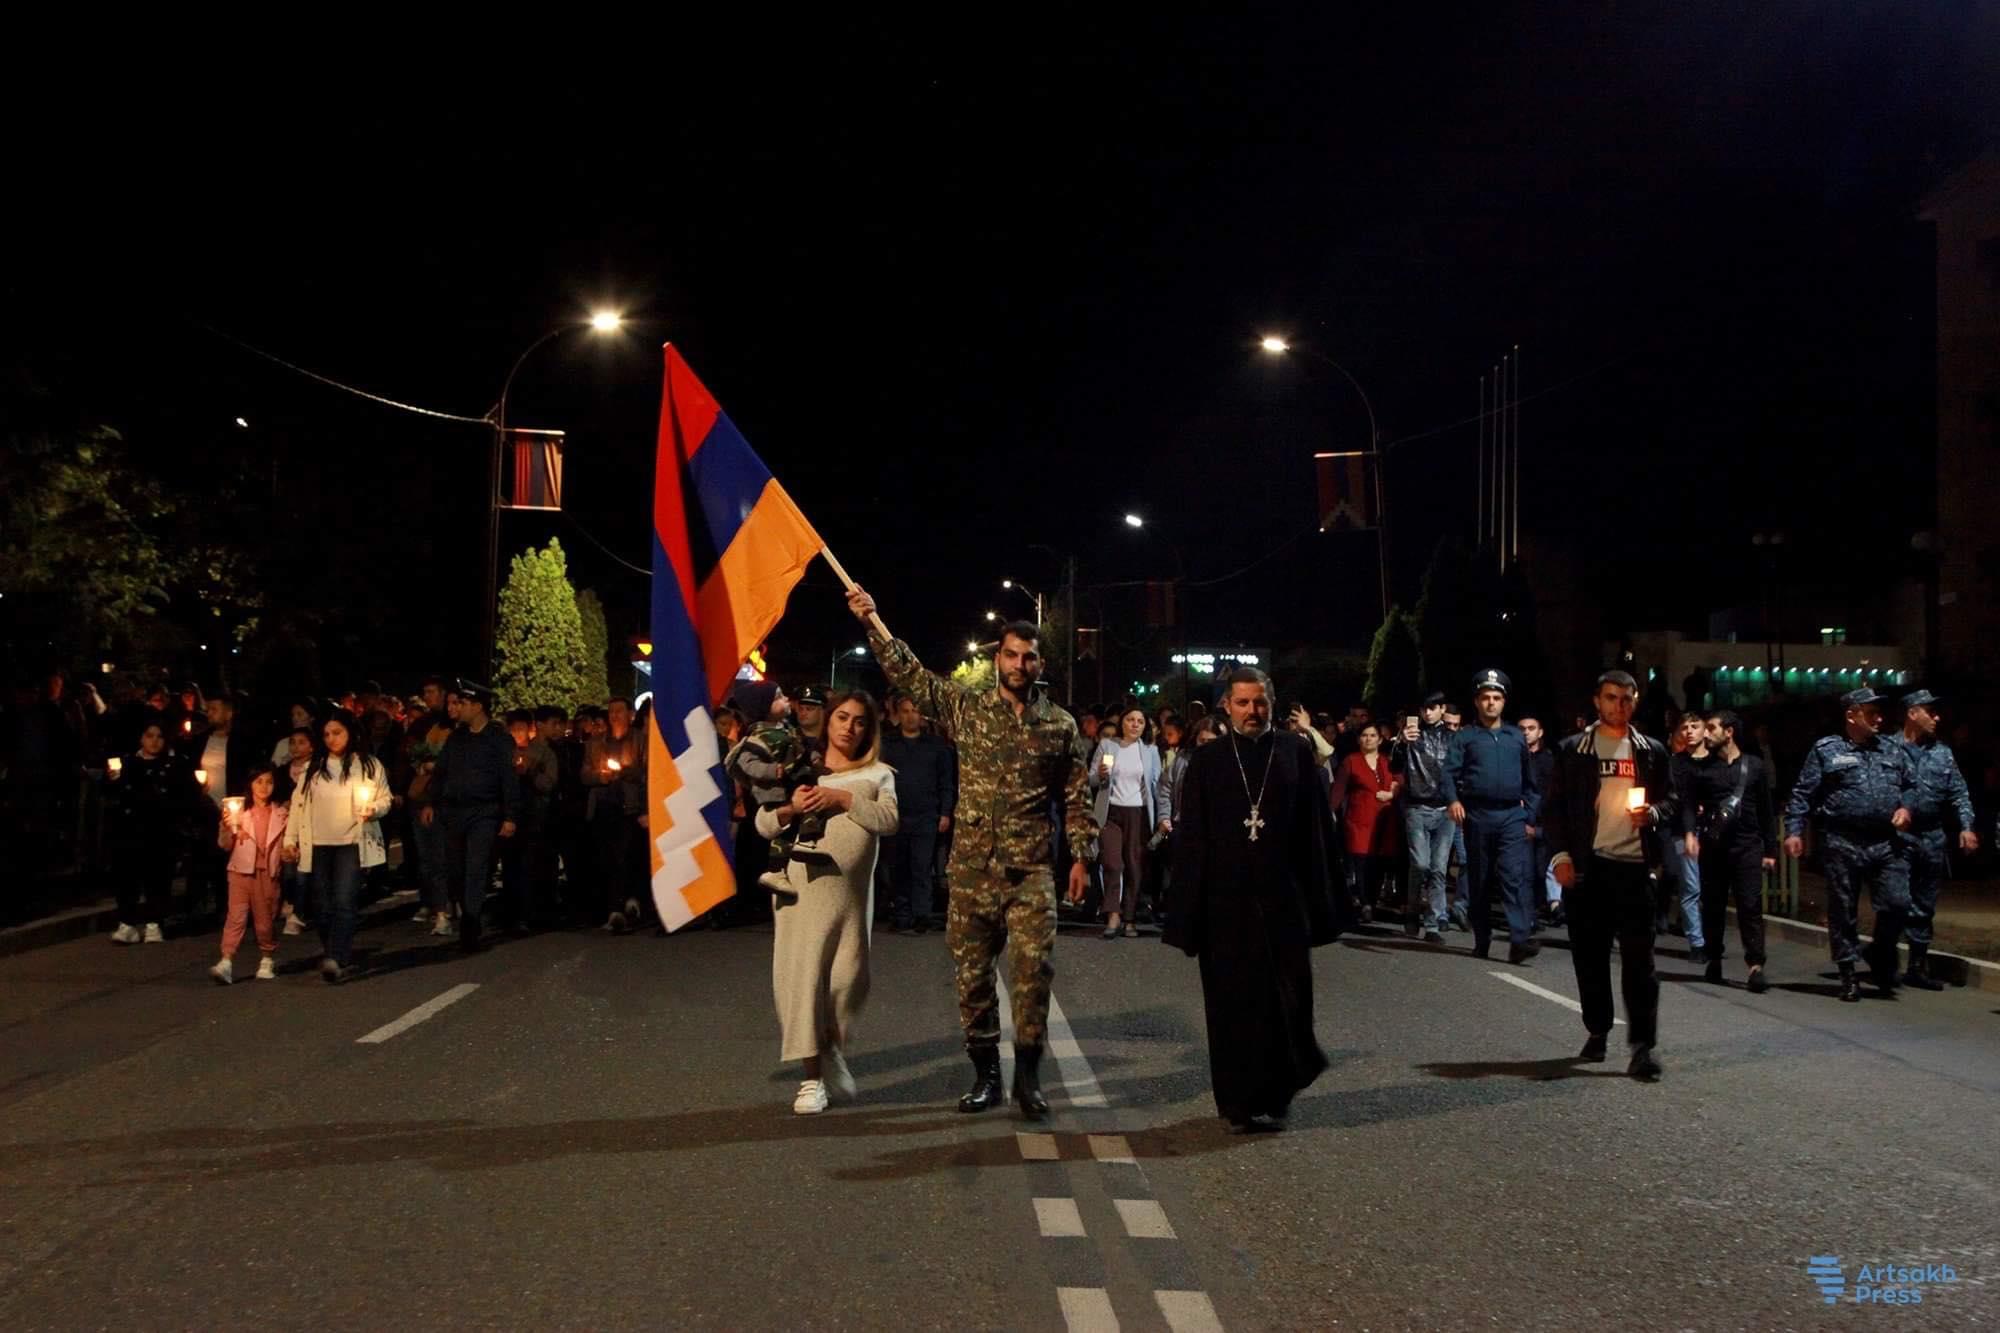 Photo of Ստեփանակերտում «Արցախն ապրում է» խորագրով ջահերթ է կազմակերպվել